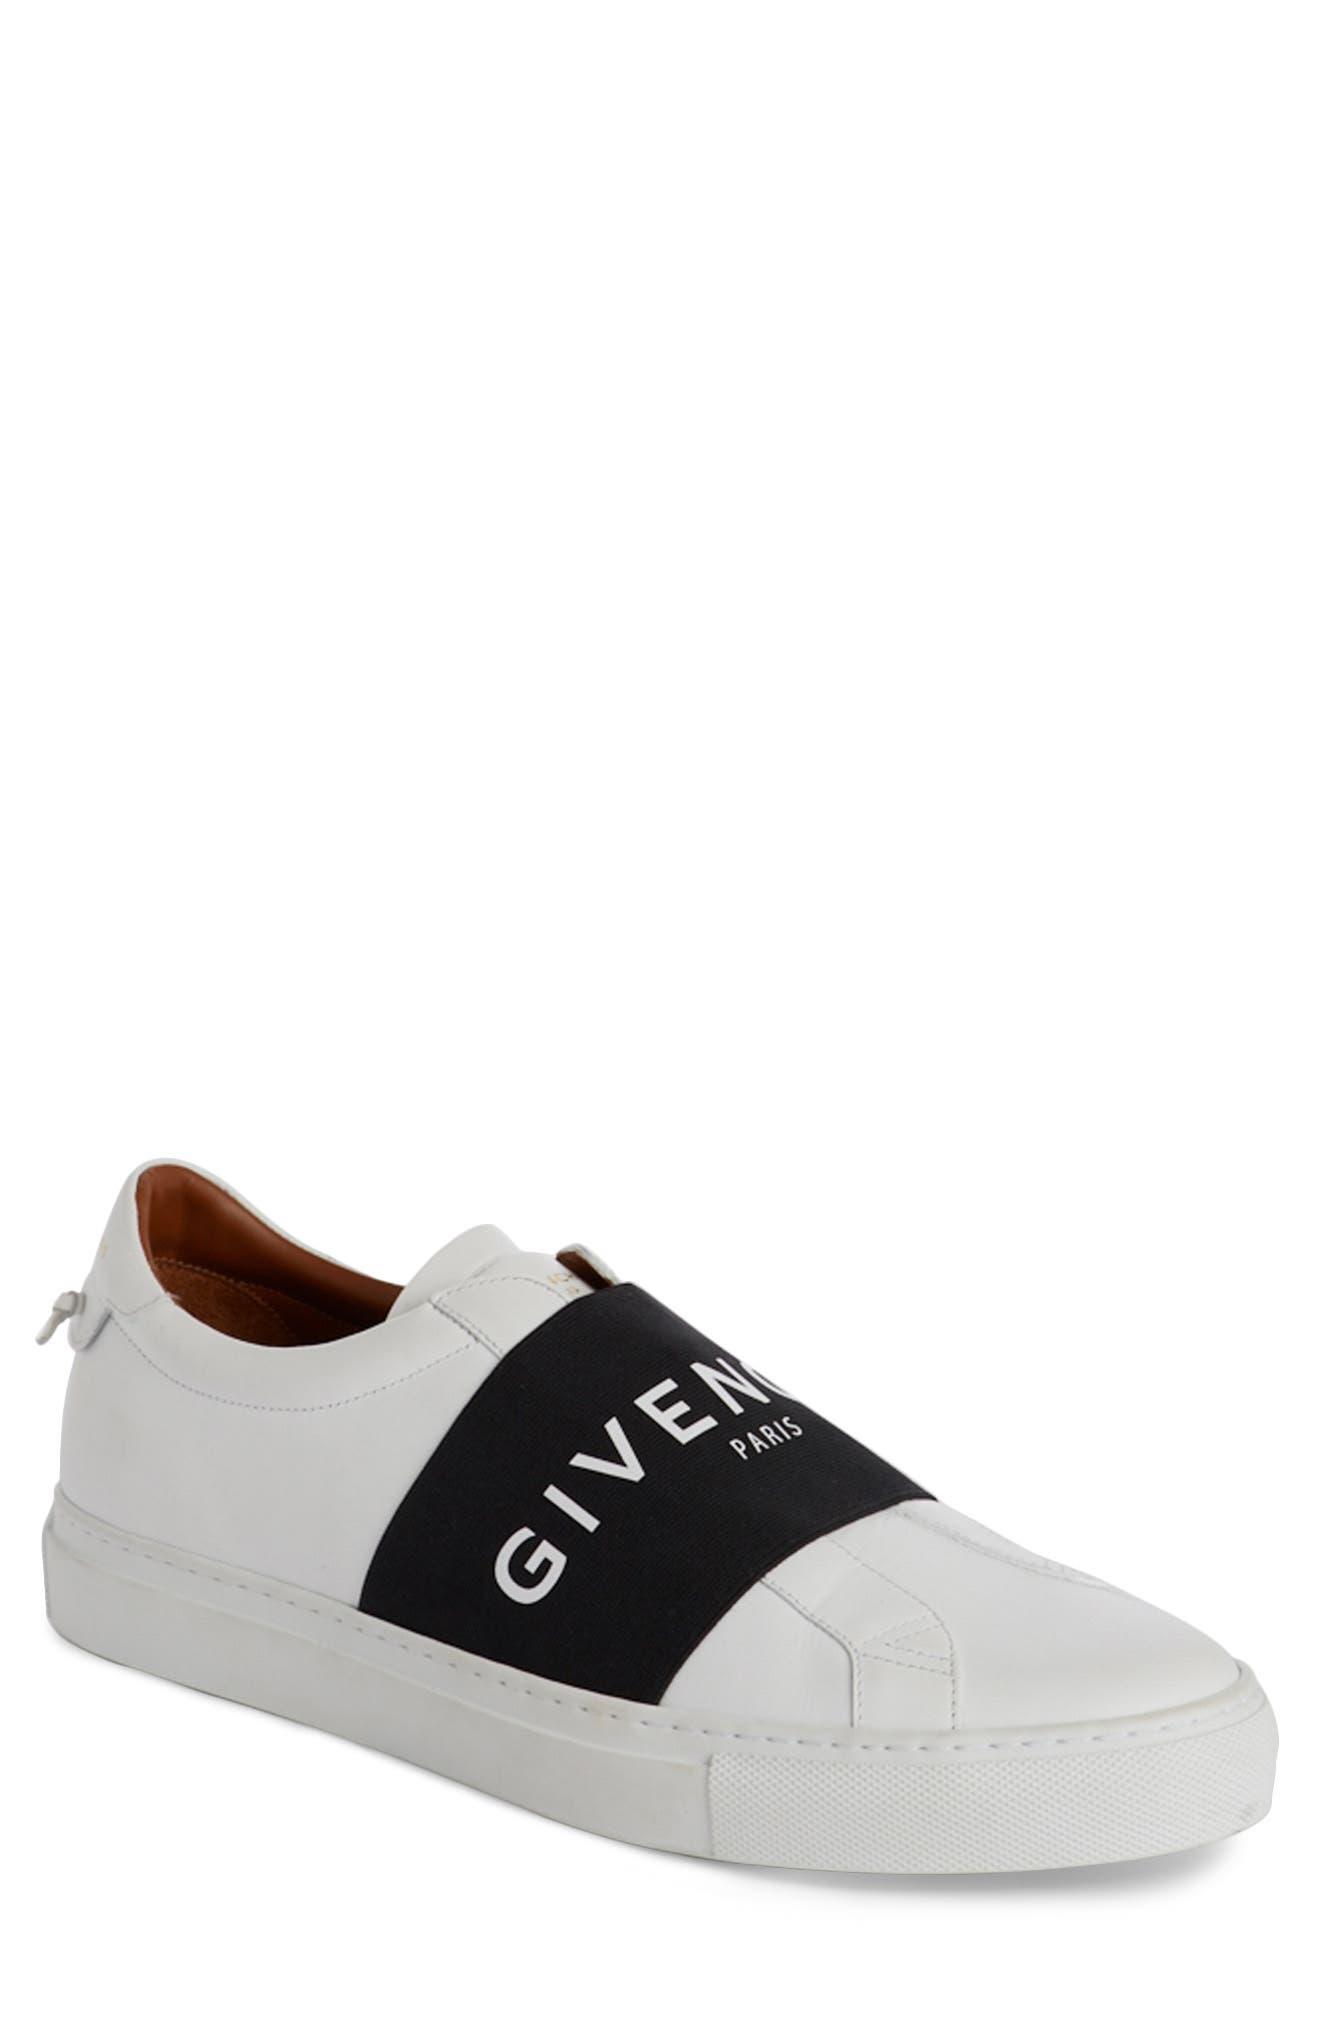 Givenchy Logo Strap Slip-On Sneaker (Women)